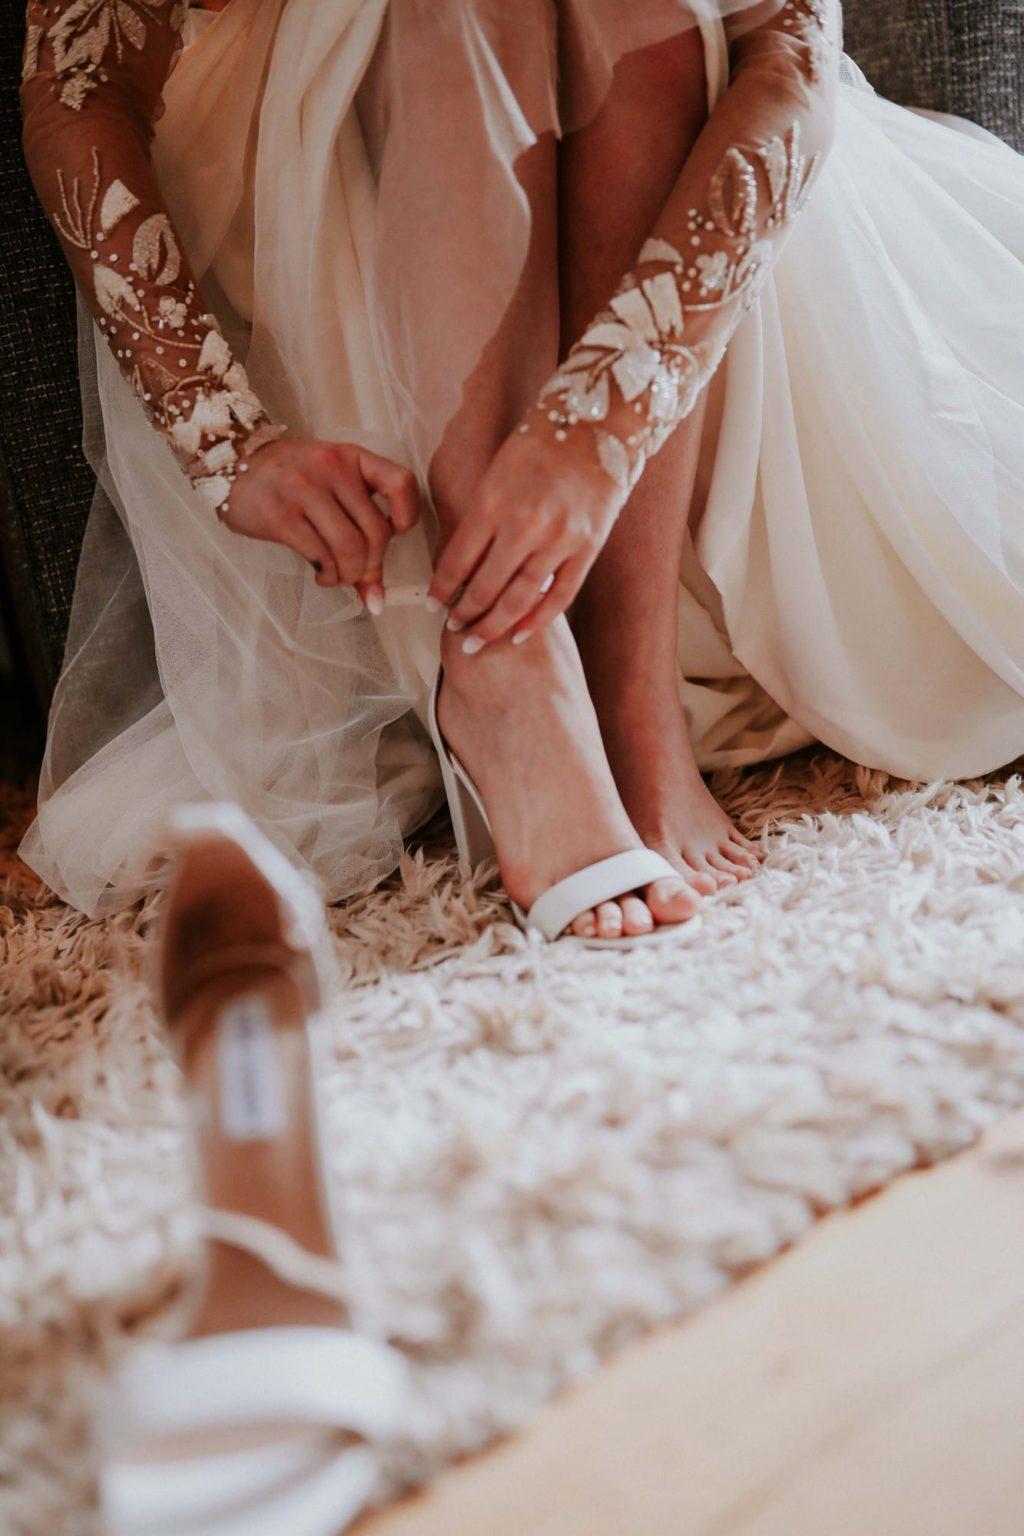 boho bride putting shoes on